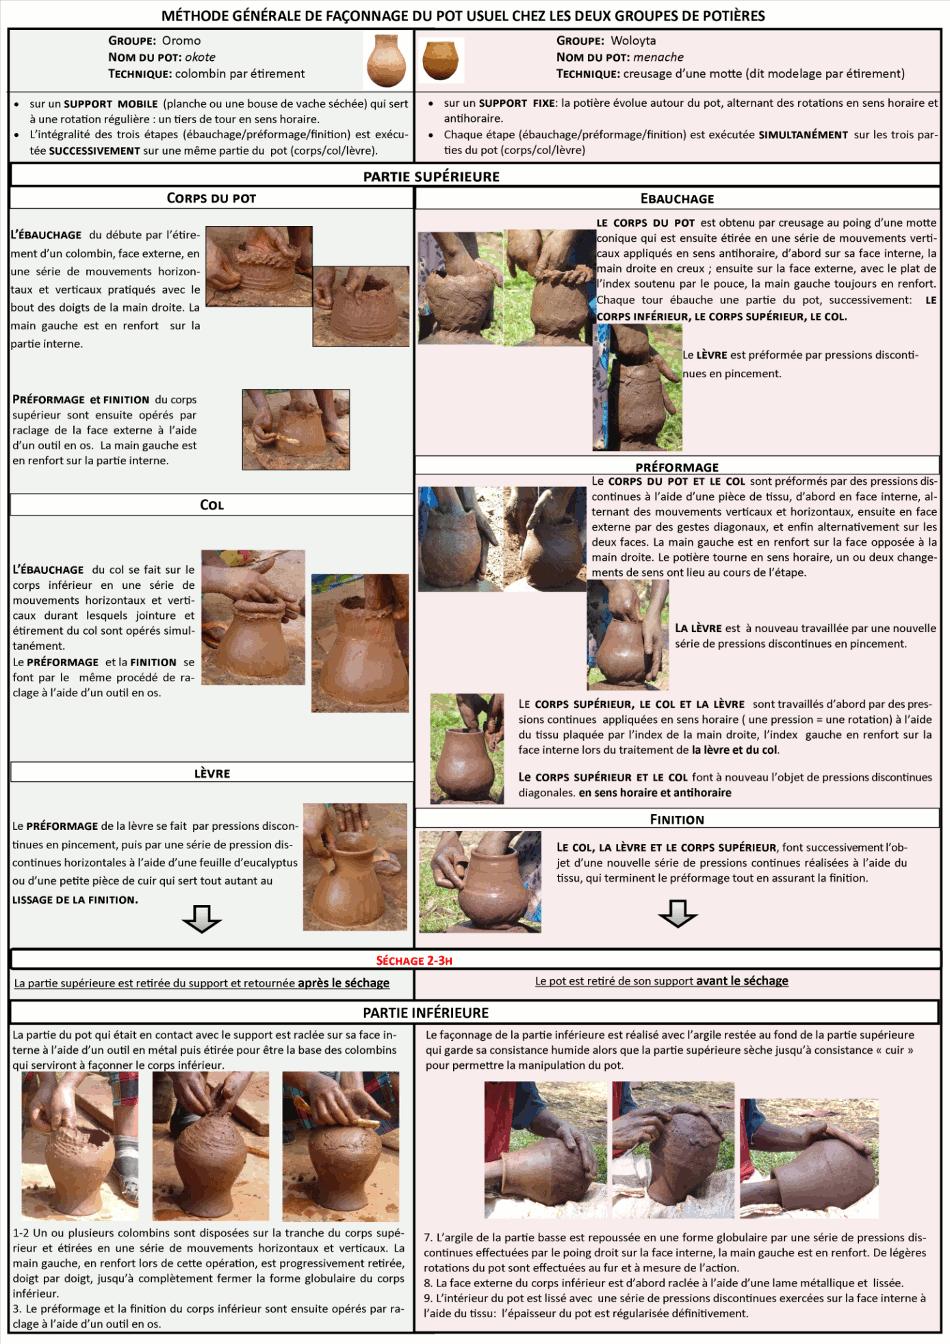 rodda et al Figure 14